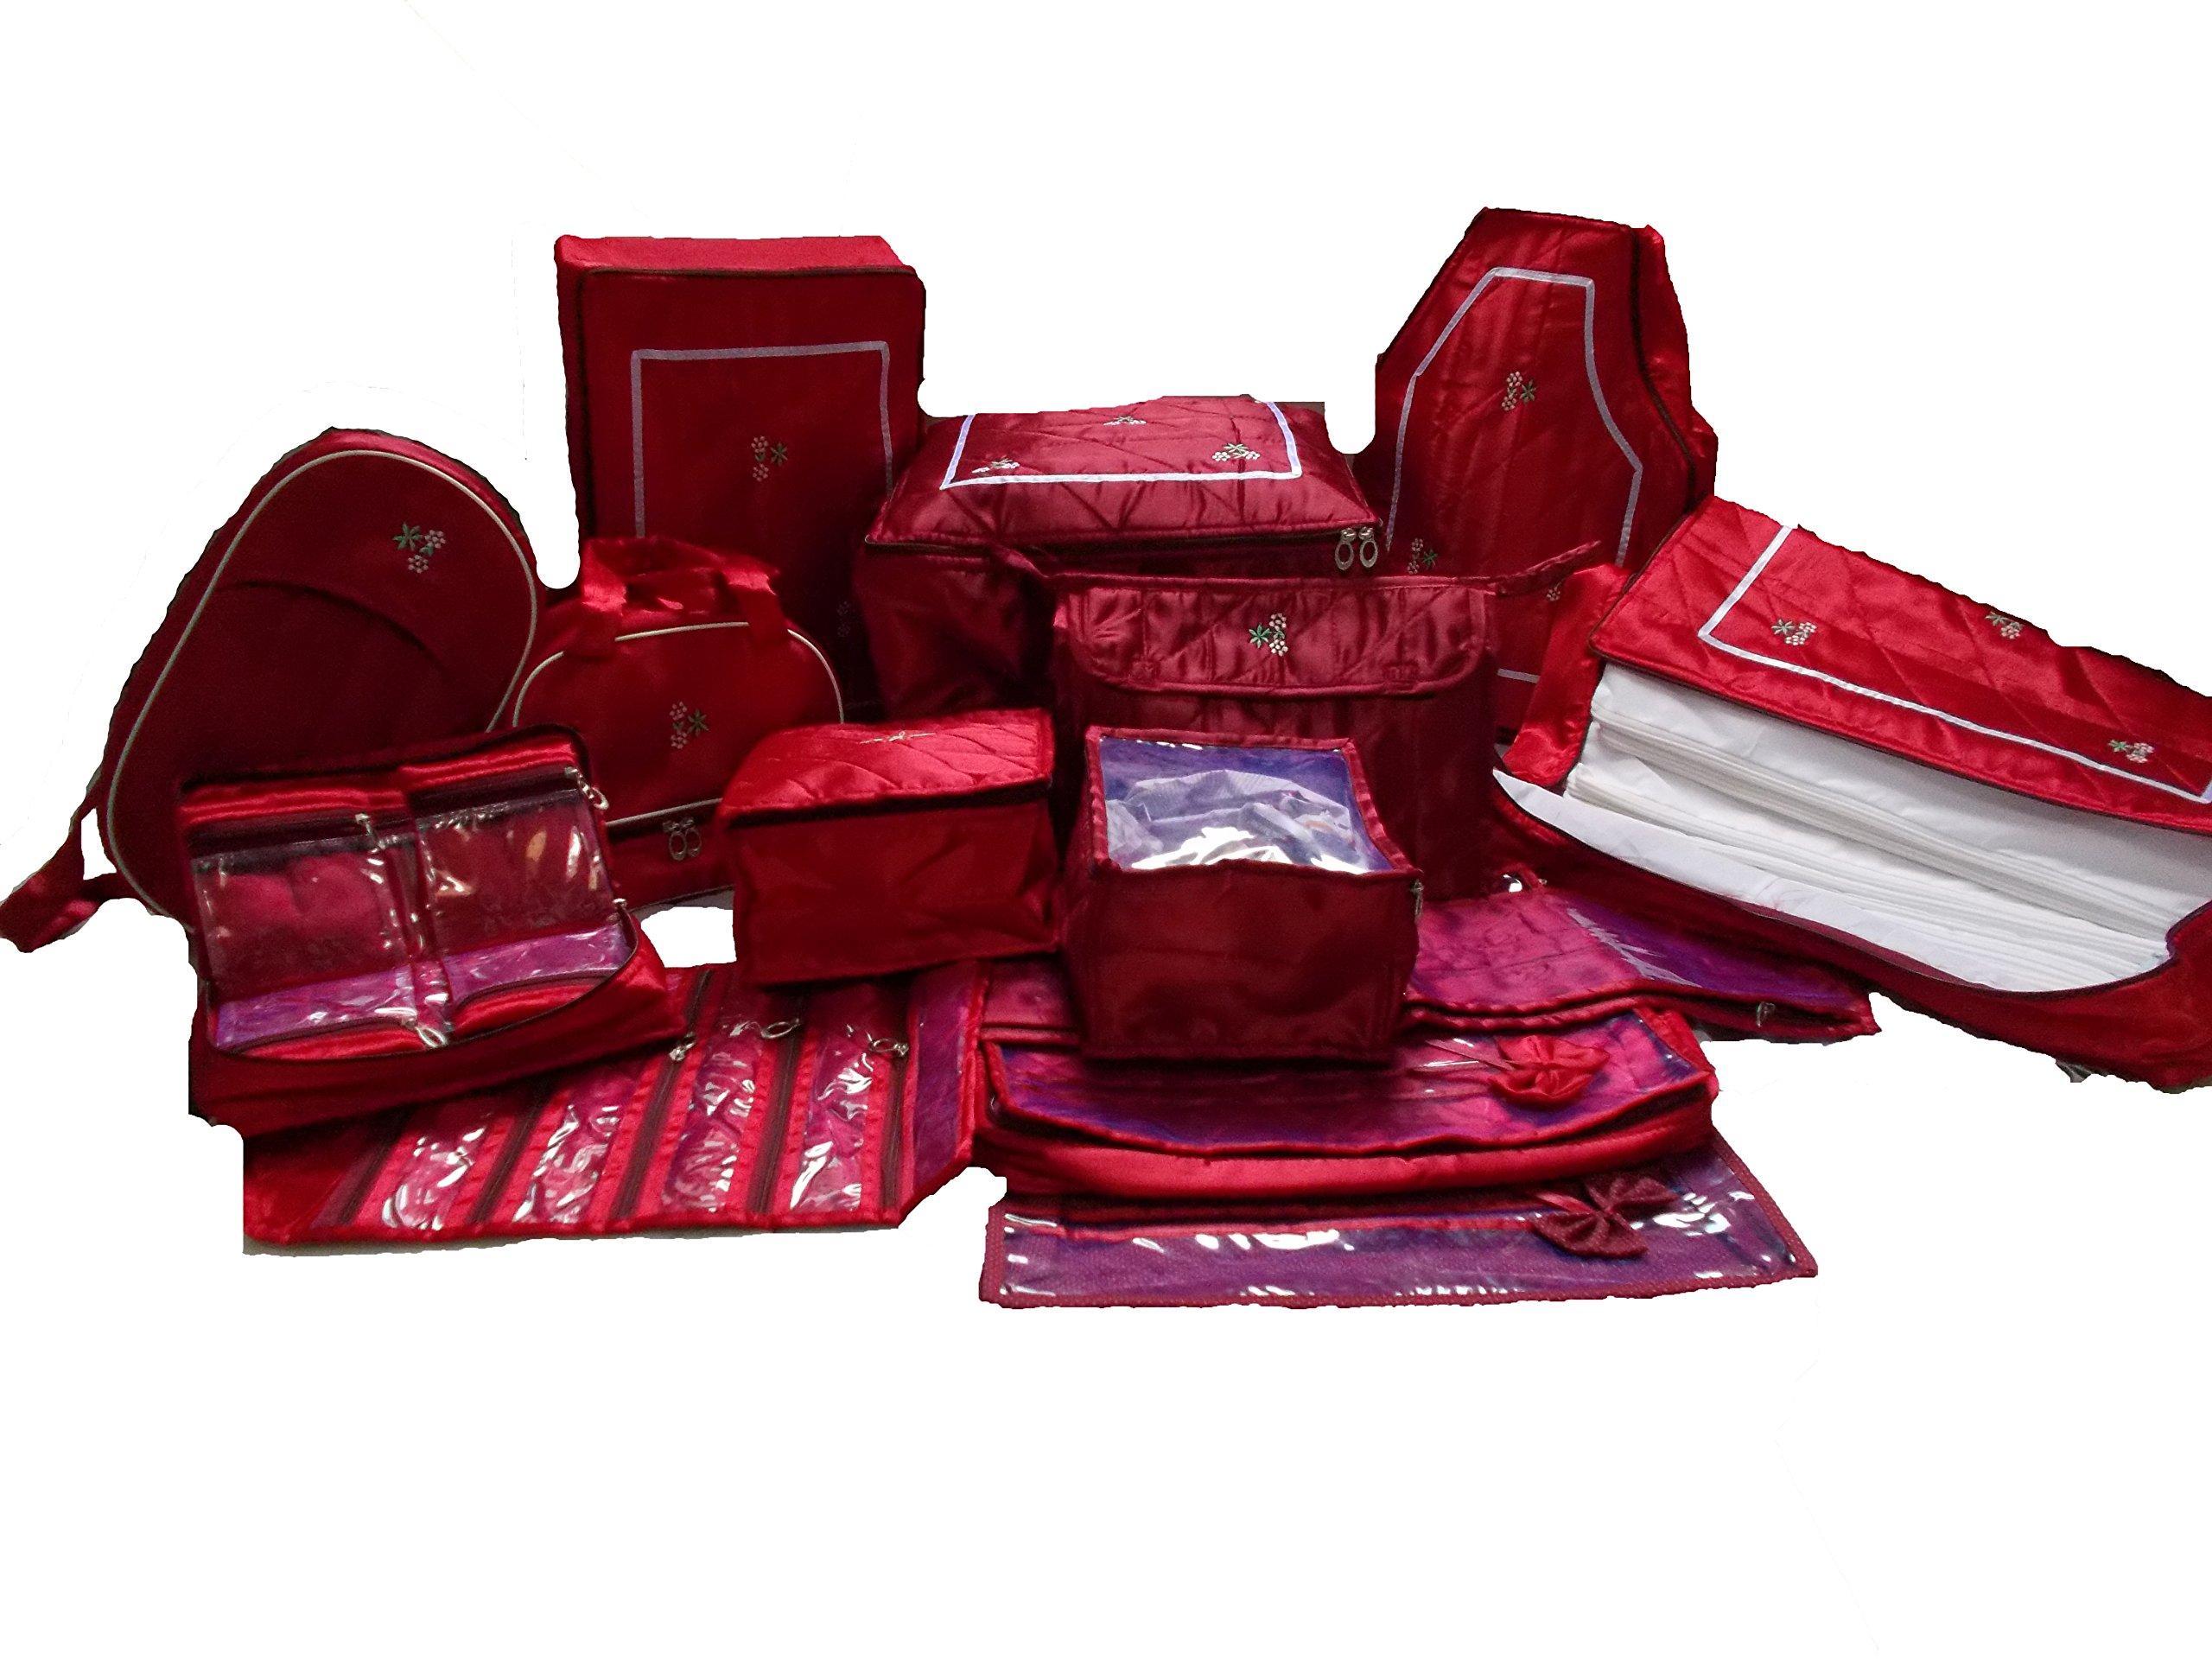 Wedding Gift, 14 pcs combo,Saree Cover, jwellery,payal, Vanity, UG ,blouse,petticote cover and 12 saree bag